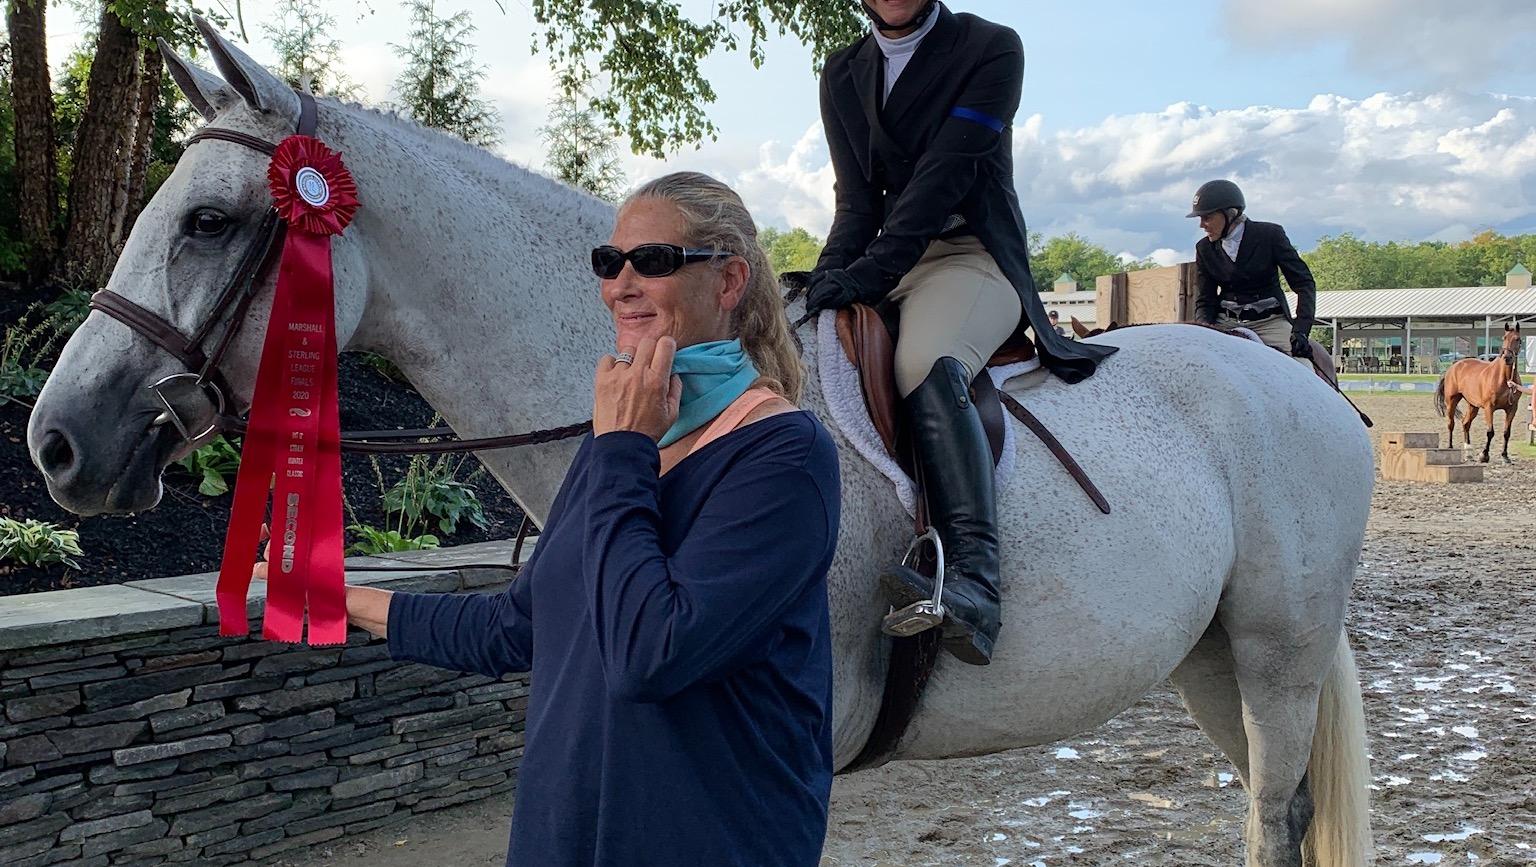 Scarmardos horse runs in $3M race - NewsBreak